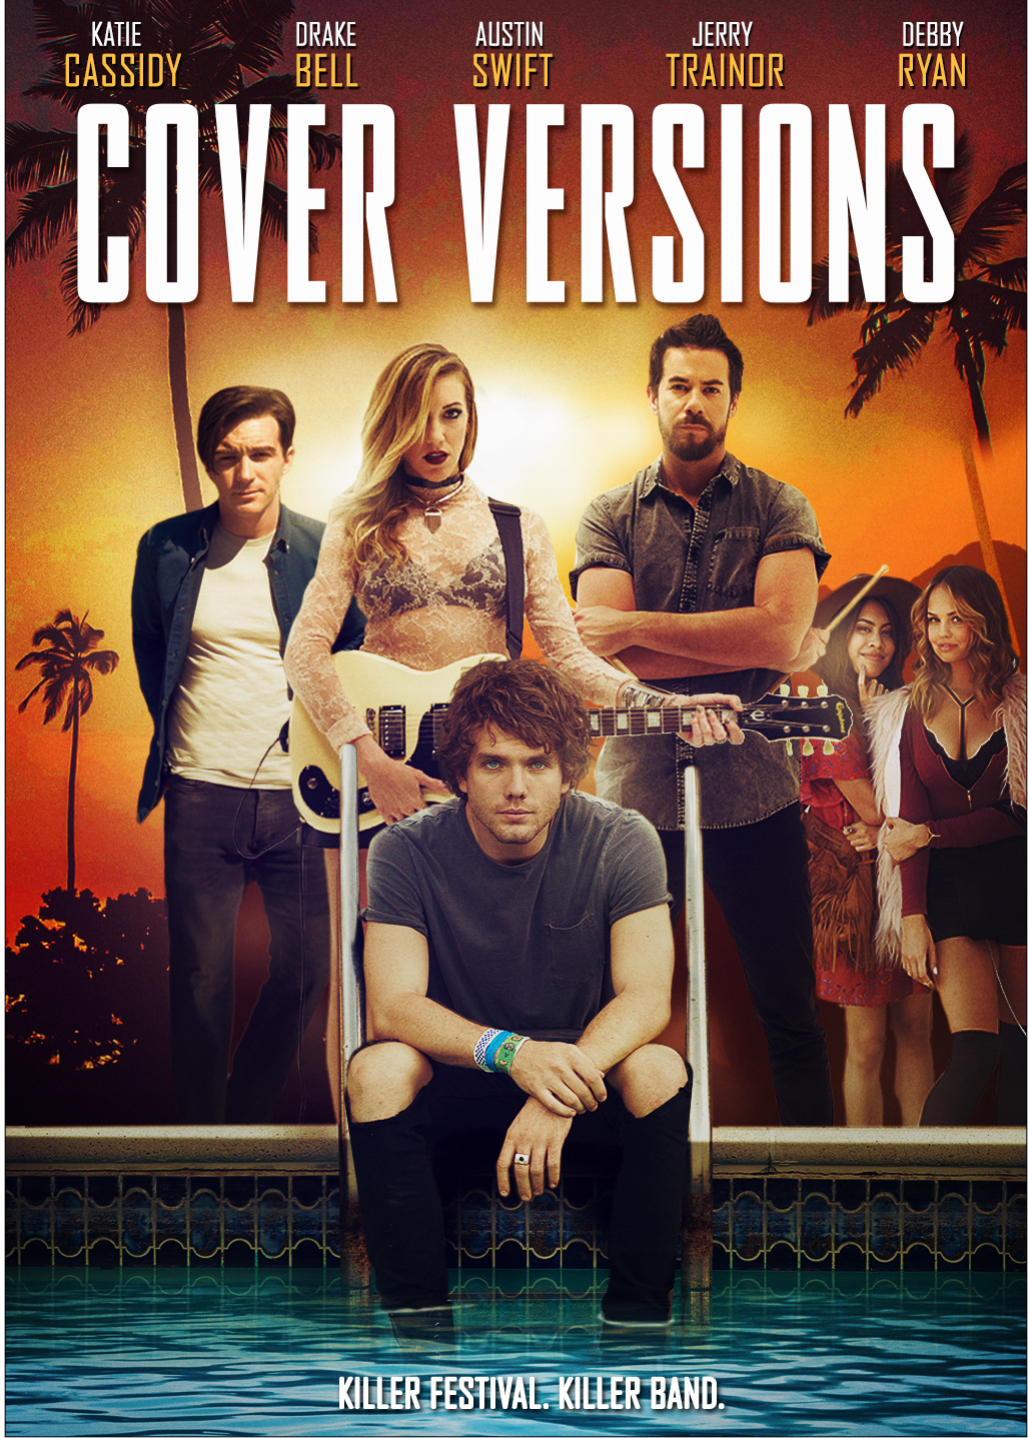 Imagen Cover Versions (2018)